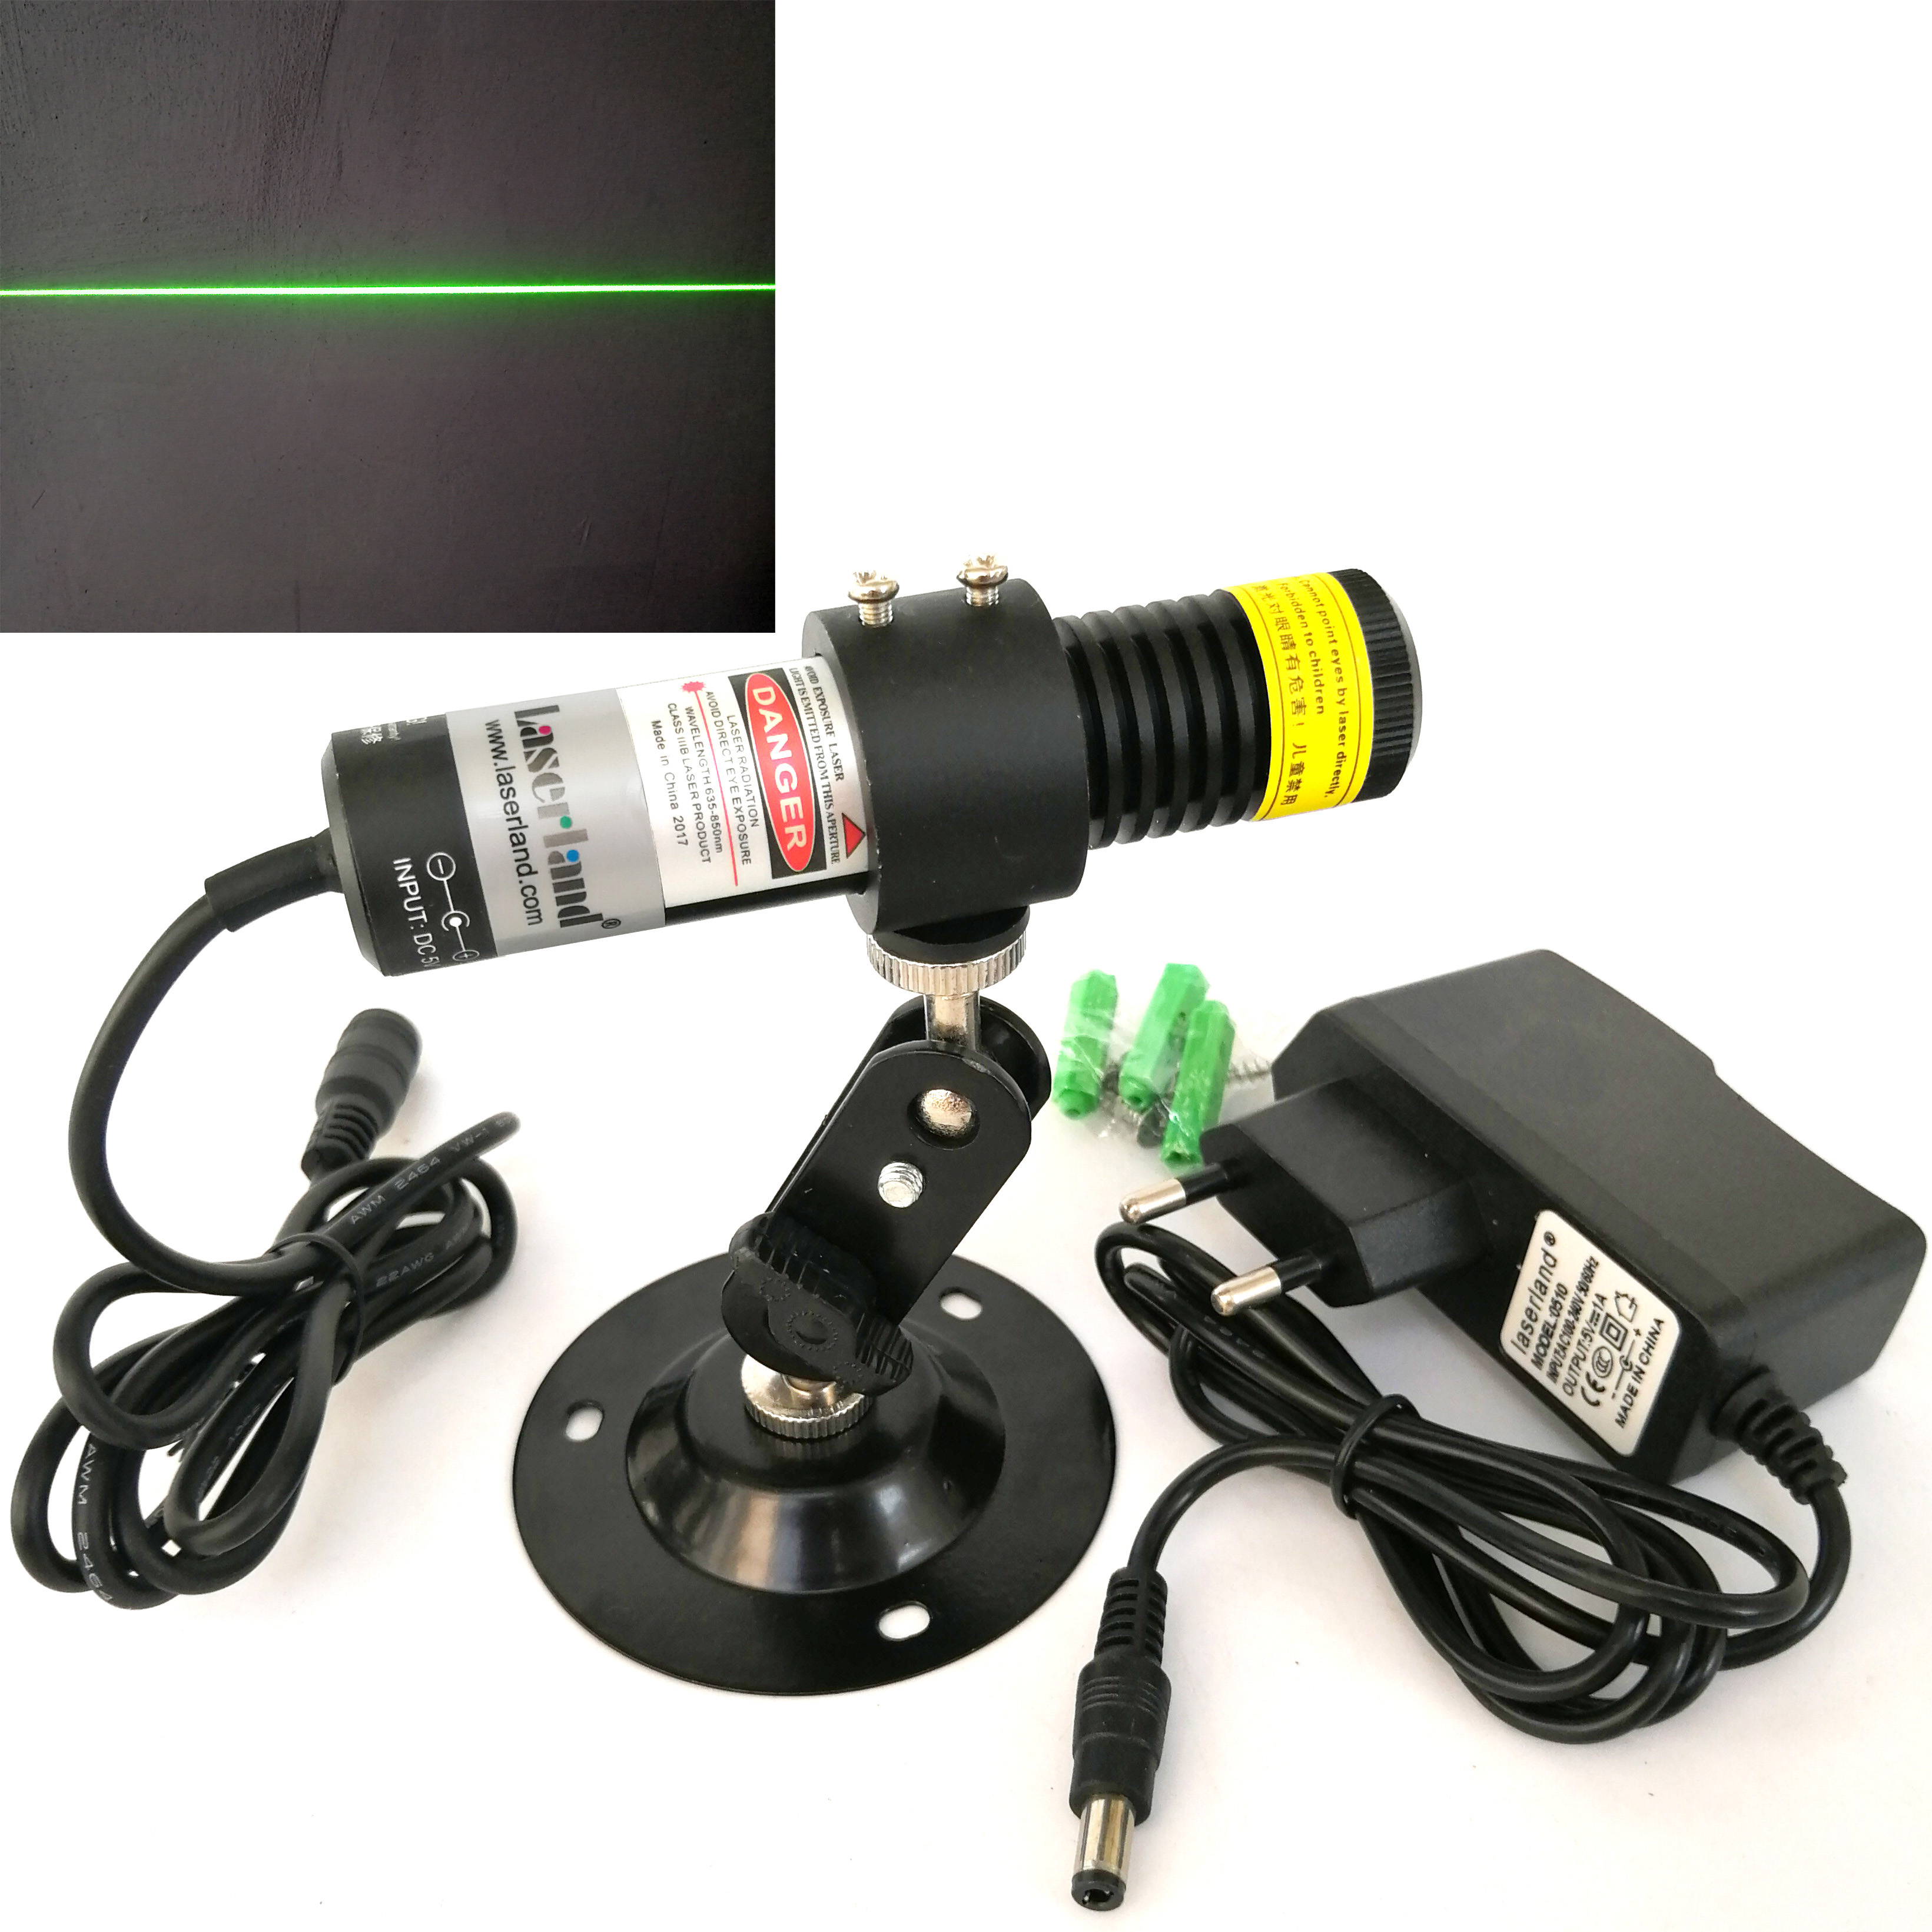 22100 Waterproof IP65 Anti-dust Green Laser Line Generator Projector Module Stone Woodwork Lumber Sawmill Cutting Alignment